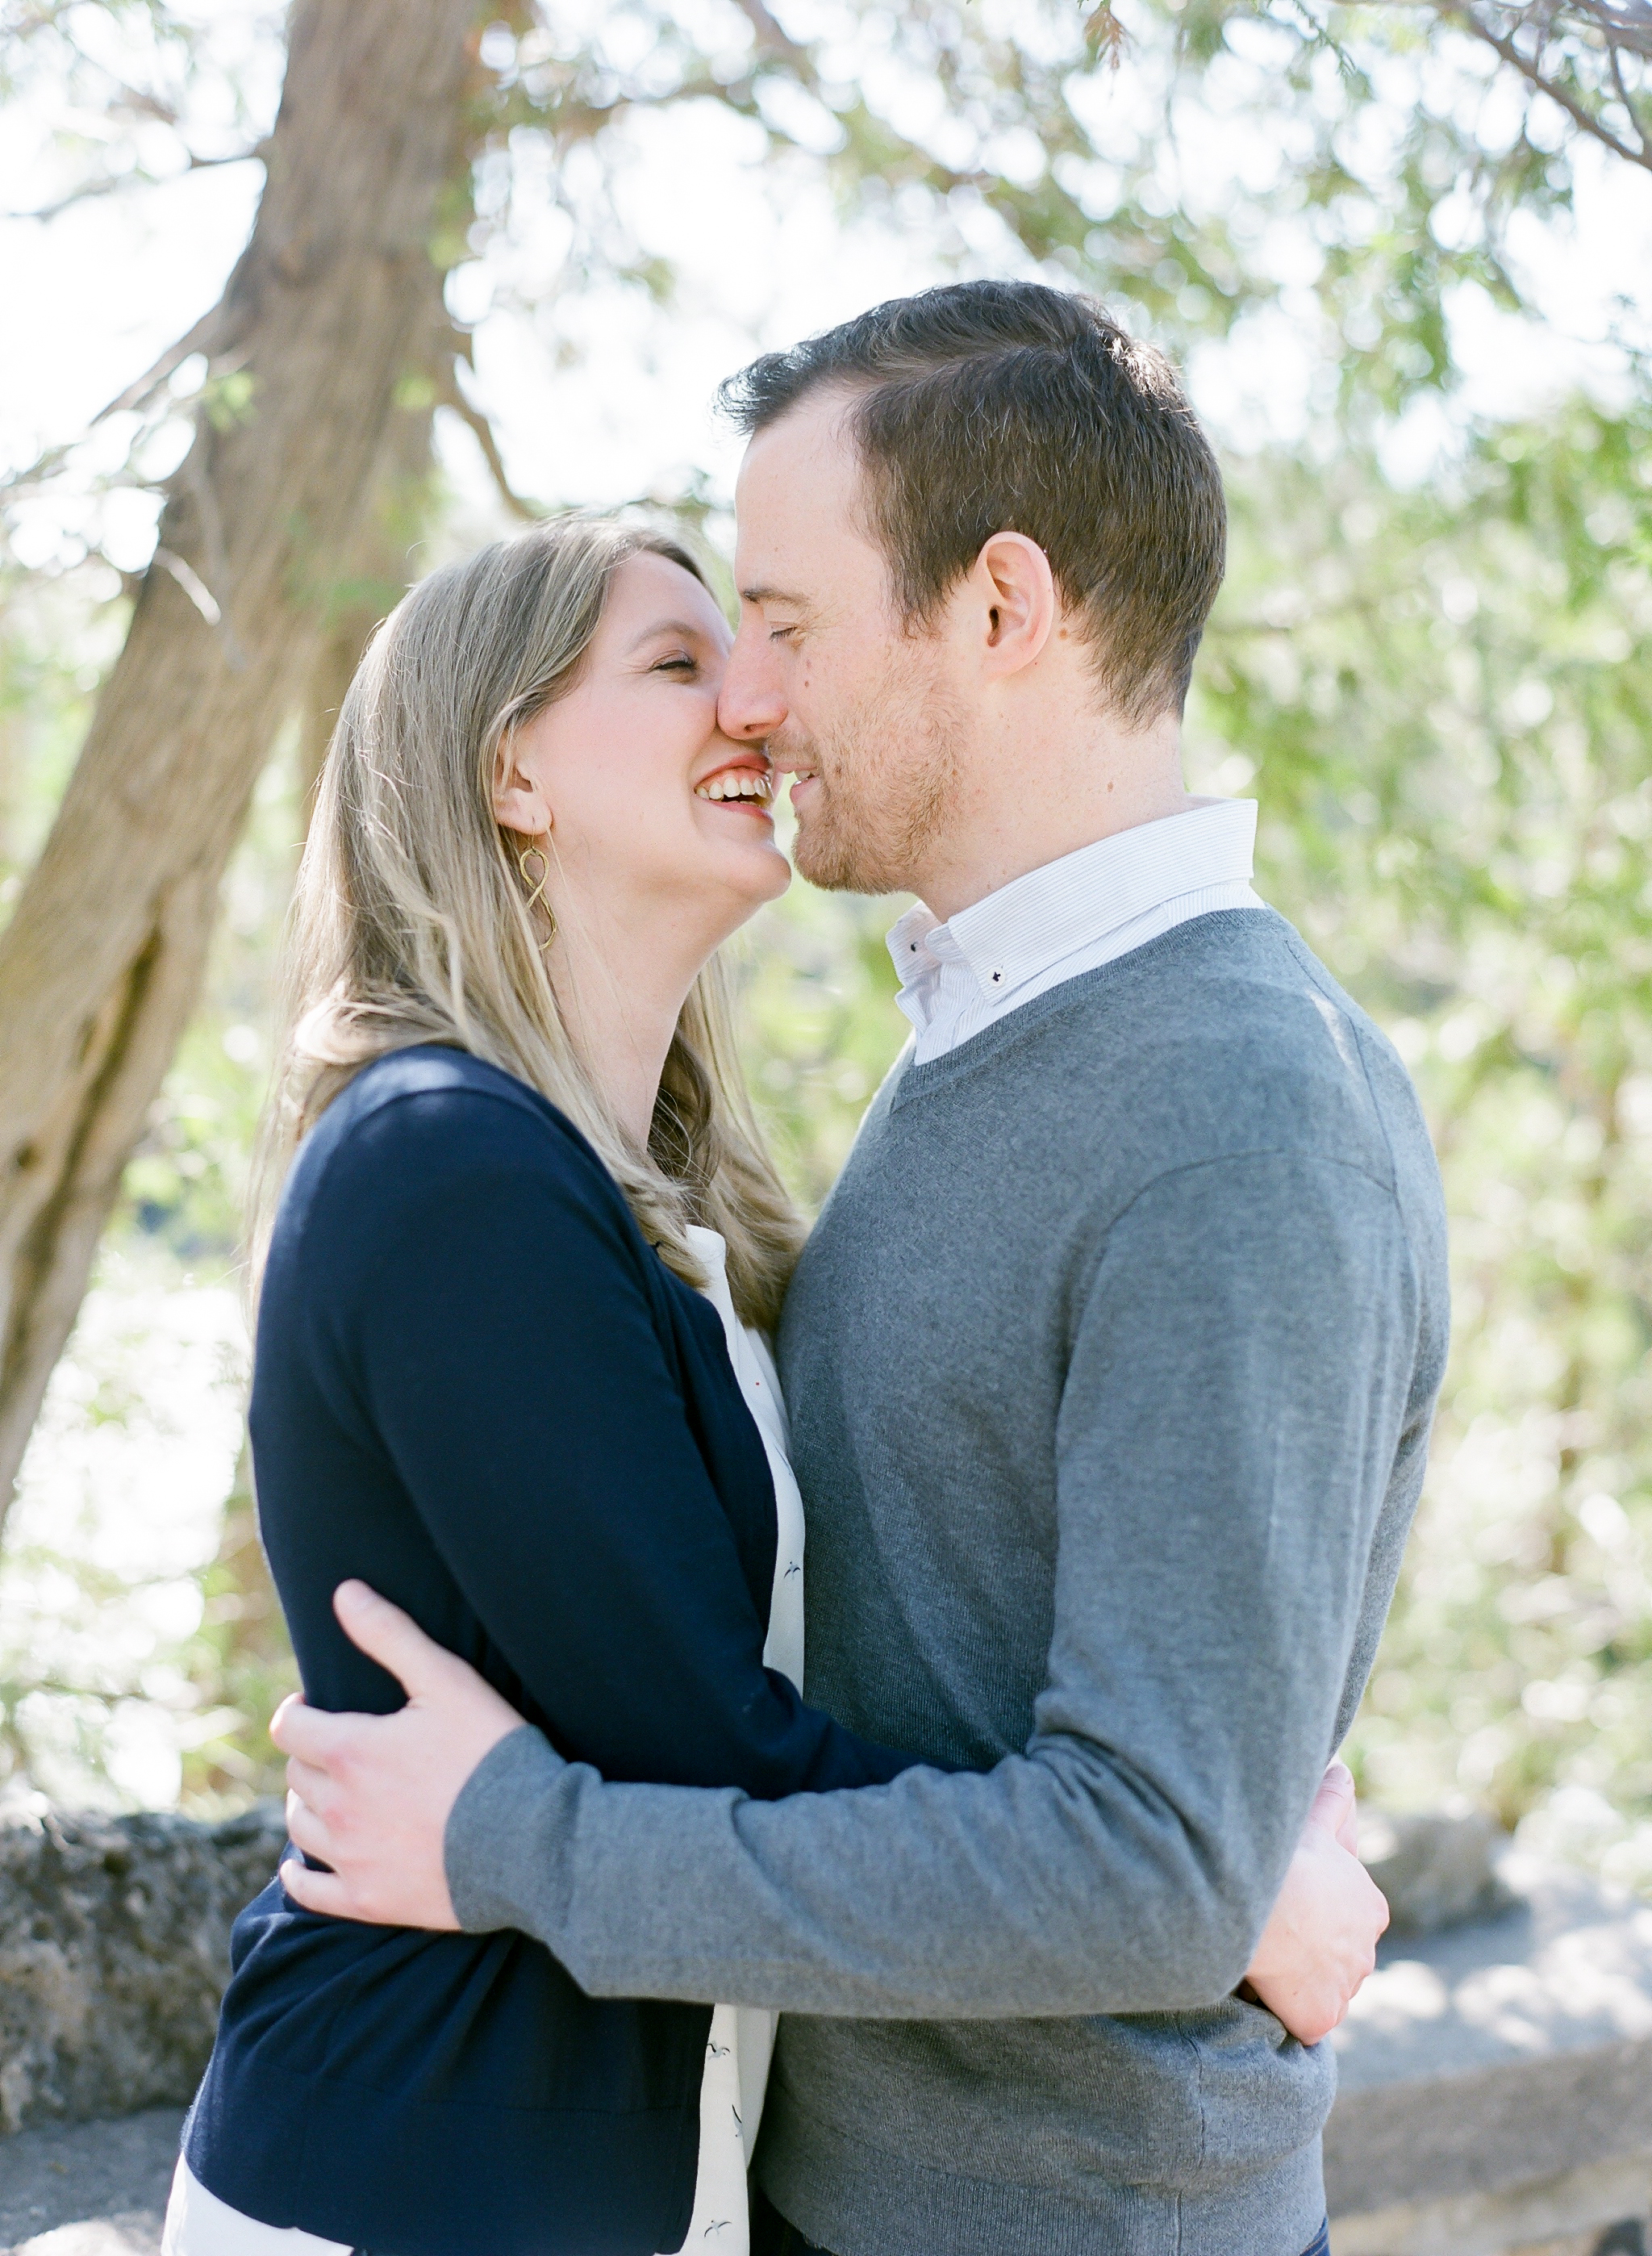 Jacqueline Anne Photography - Elora Engagement Session-9.jpg